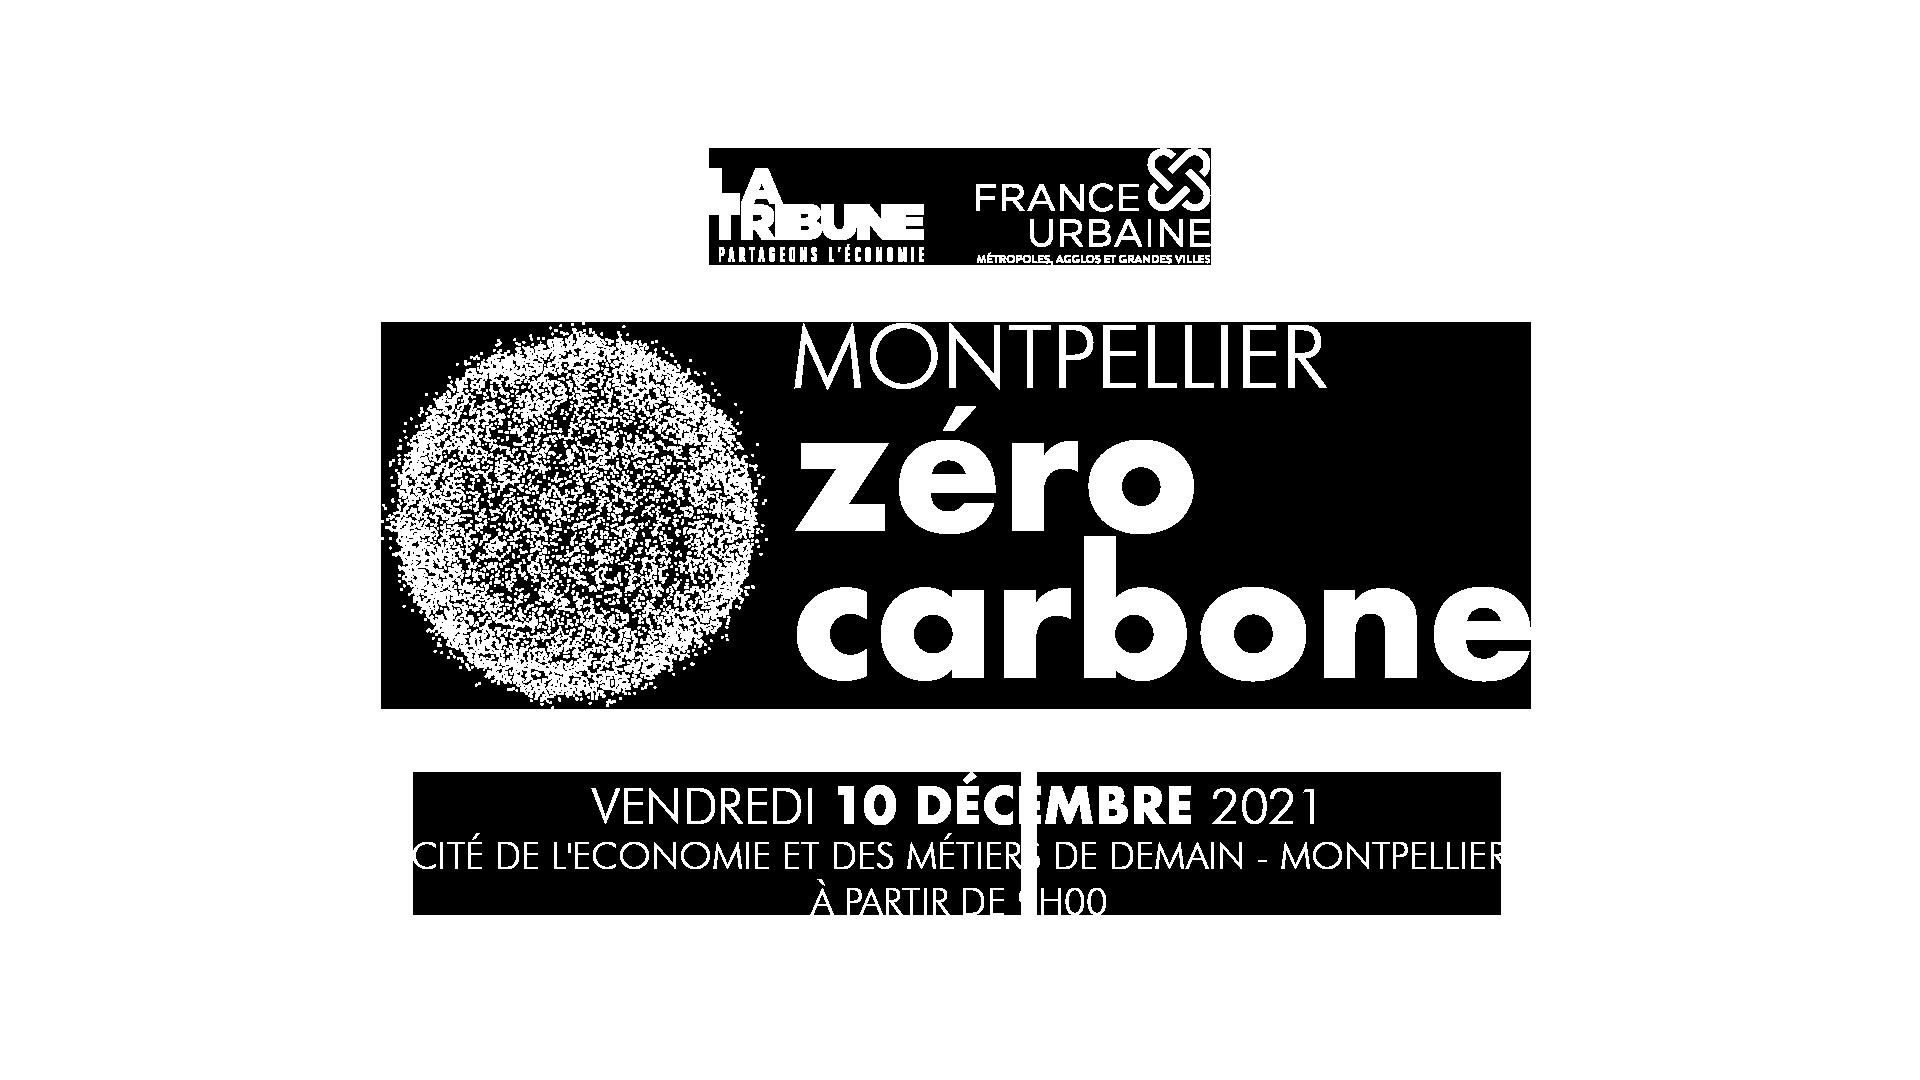 MONTPELLIER_ZERO_CARBONE_2021_SITE_1920x1080